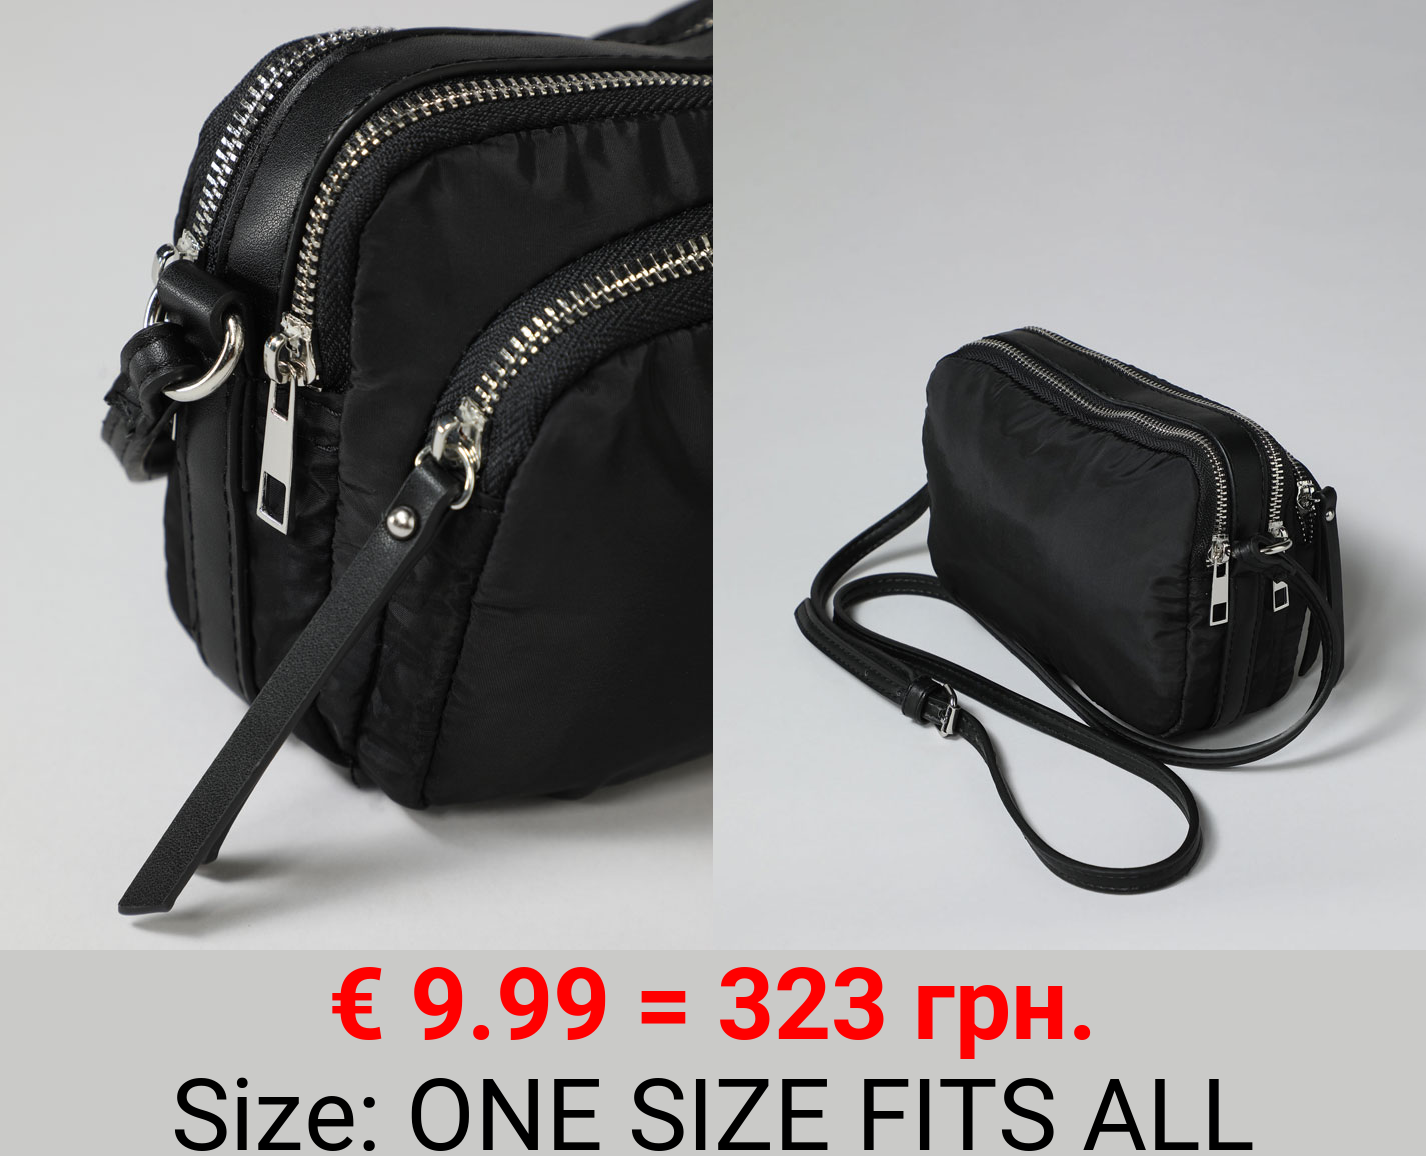 Basic crossbody bag